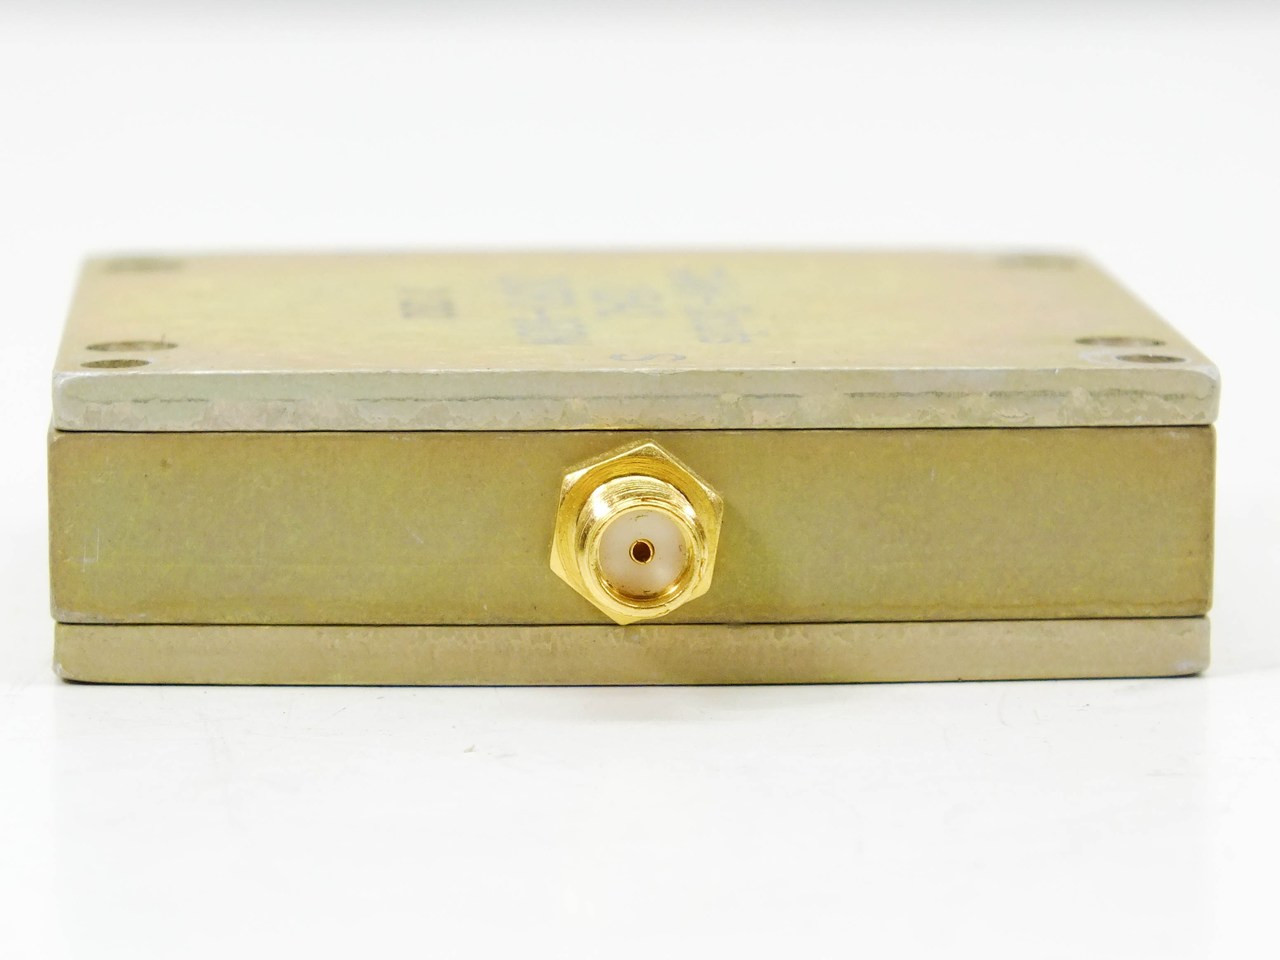 Mini Circuits Zn3pd 900w Coaxial Power Splitter Combiner 3 Way 650 Coax Wiring Diagram 1050 Mhz 15542